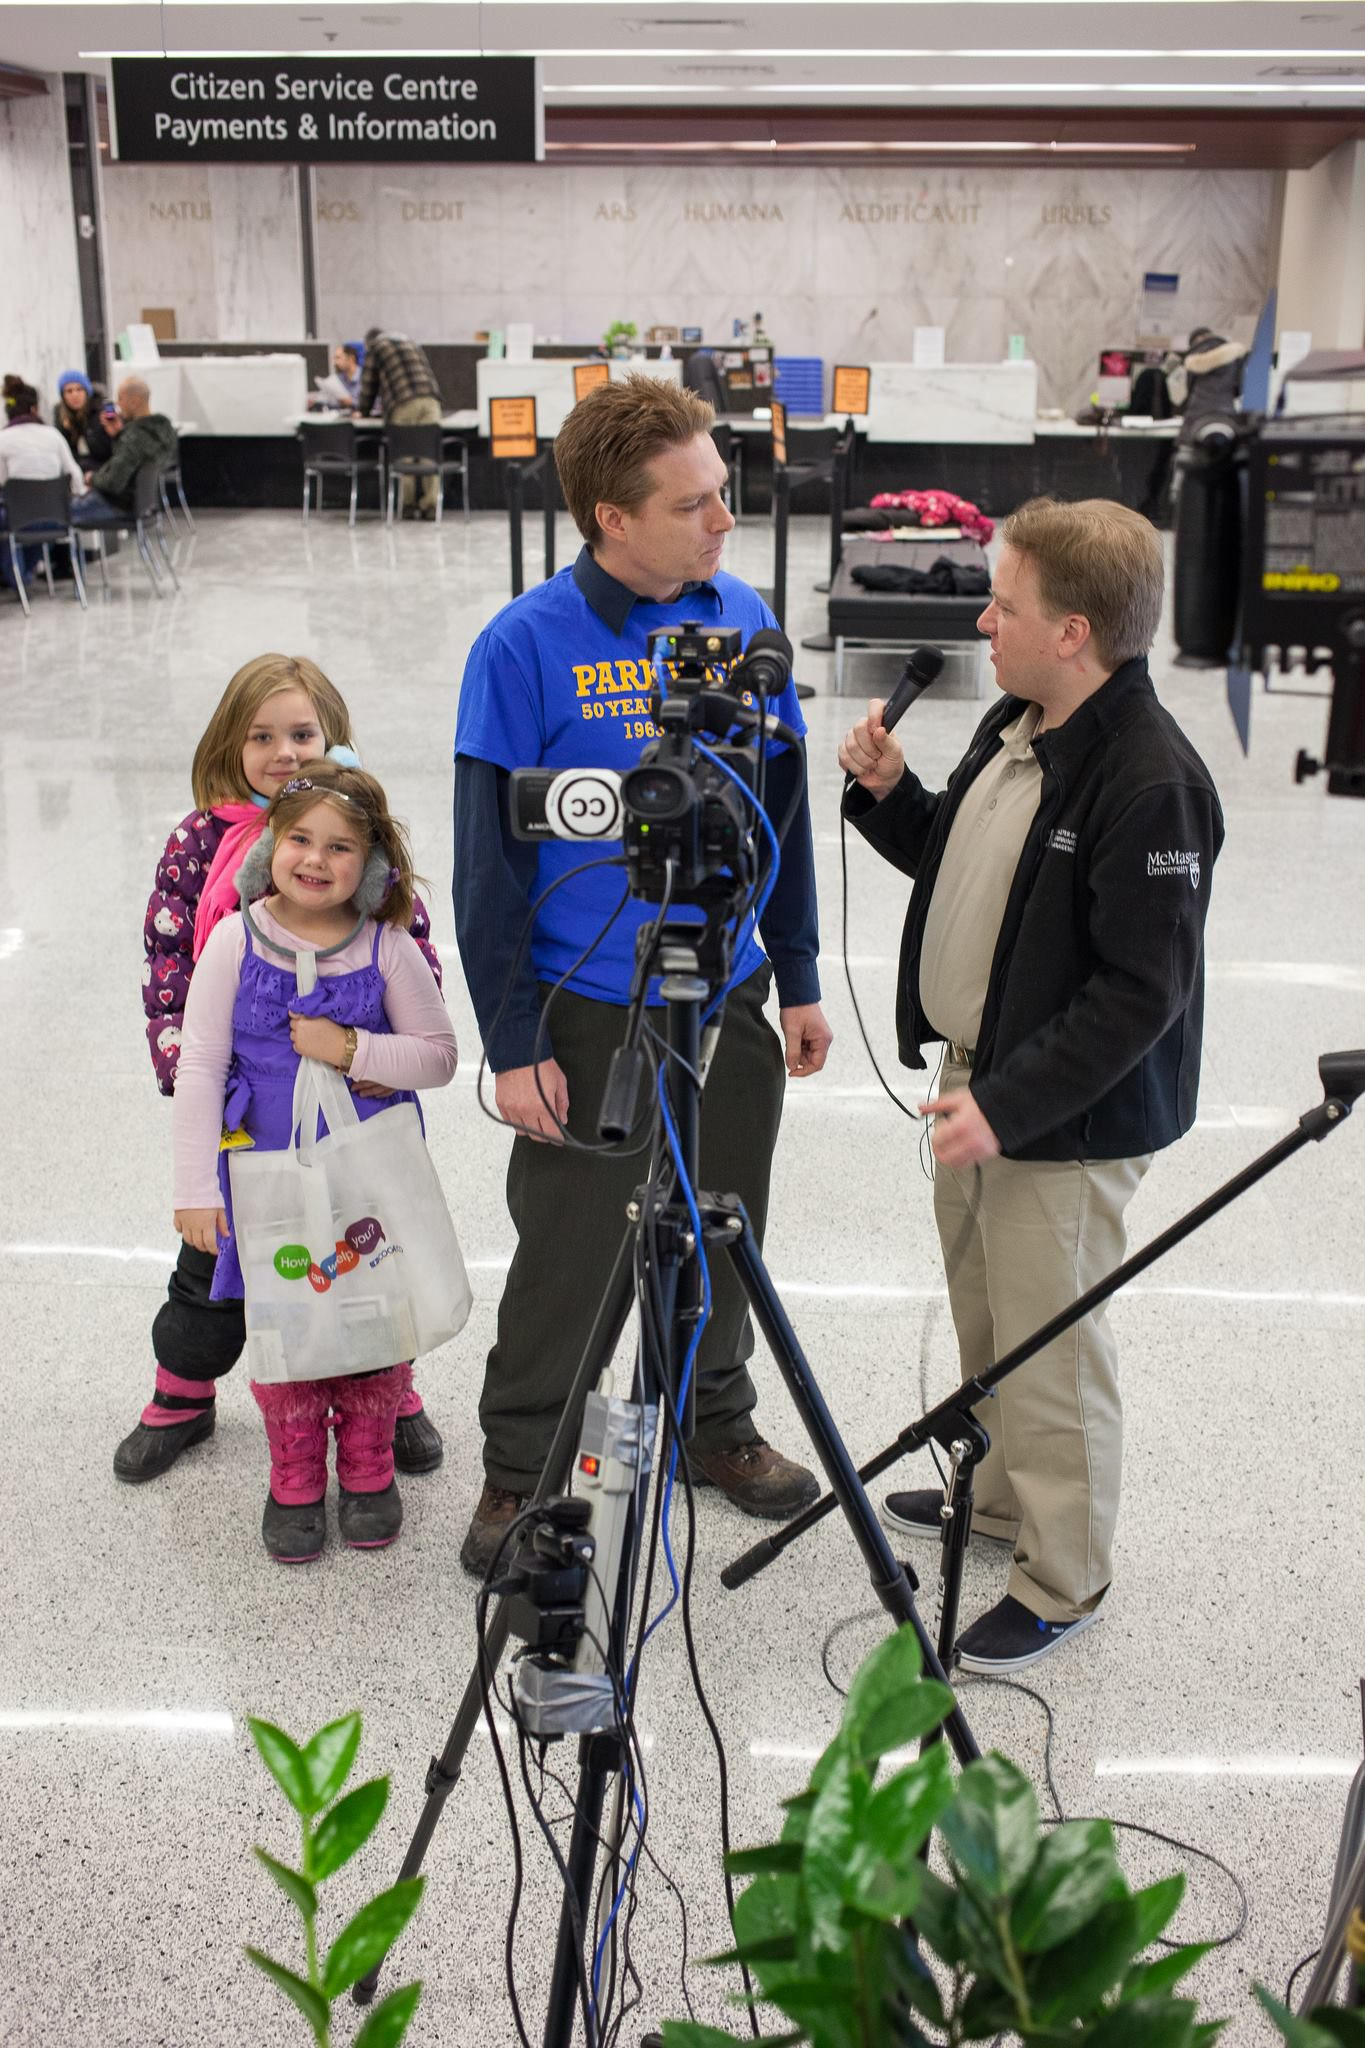 Coleman interviews a School Board Trustee